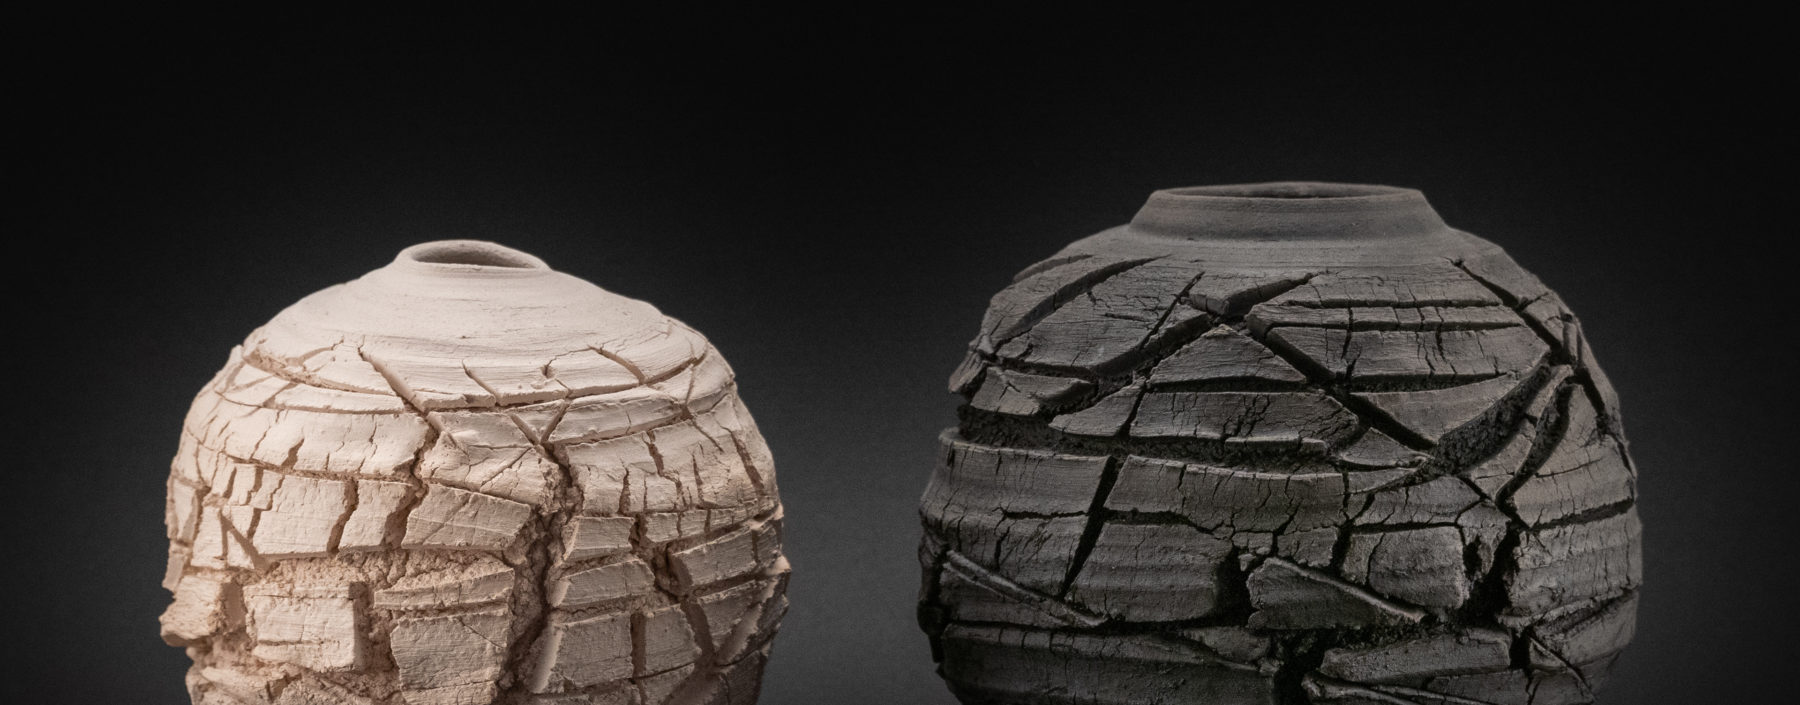 Eris and Charon: Raku-fired Whispering Globes by Ildikó Károlyi